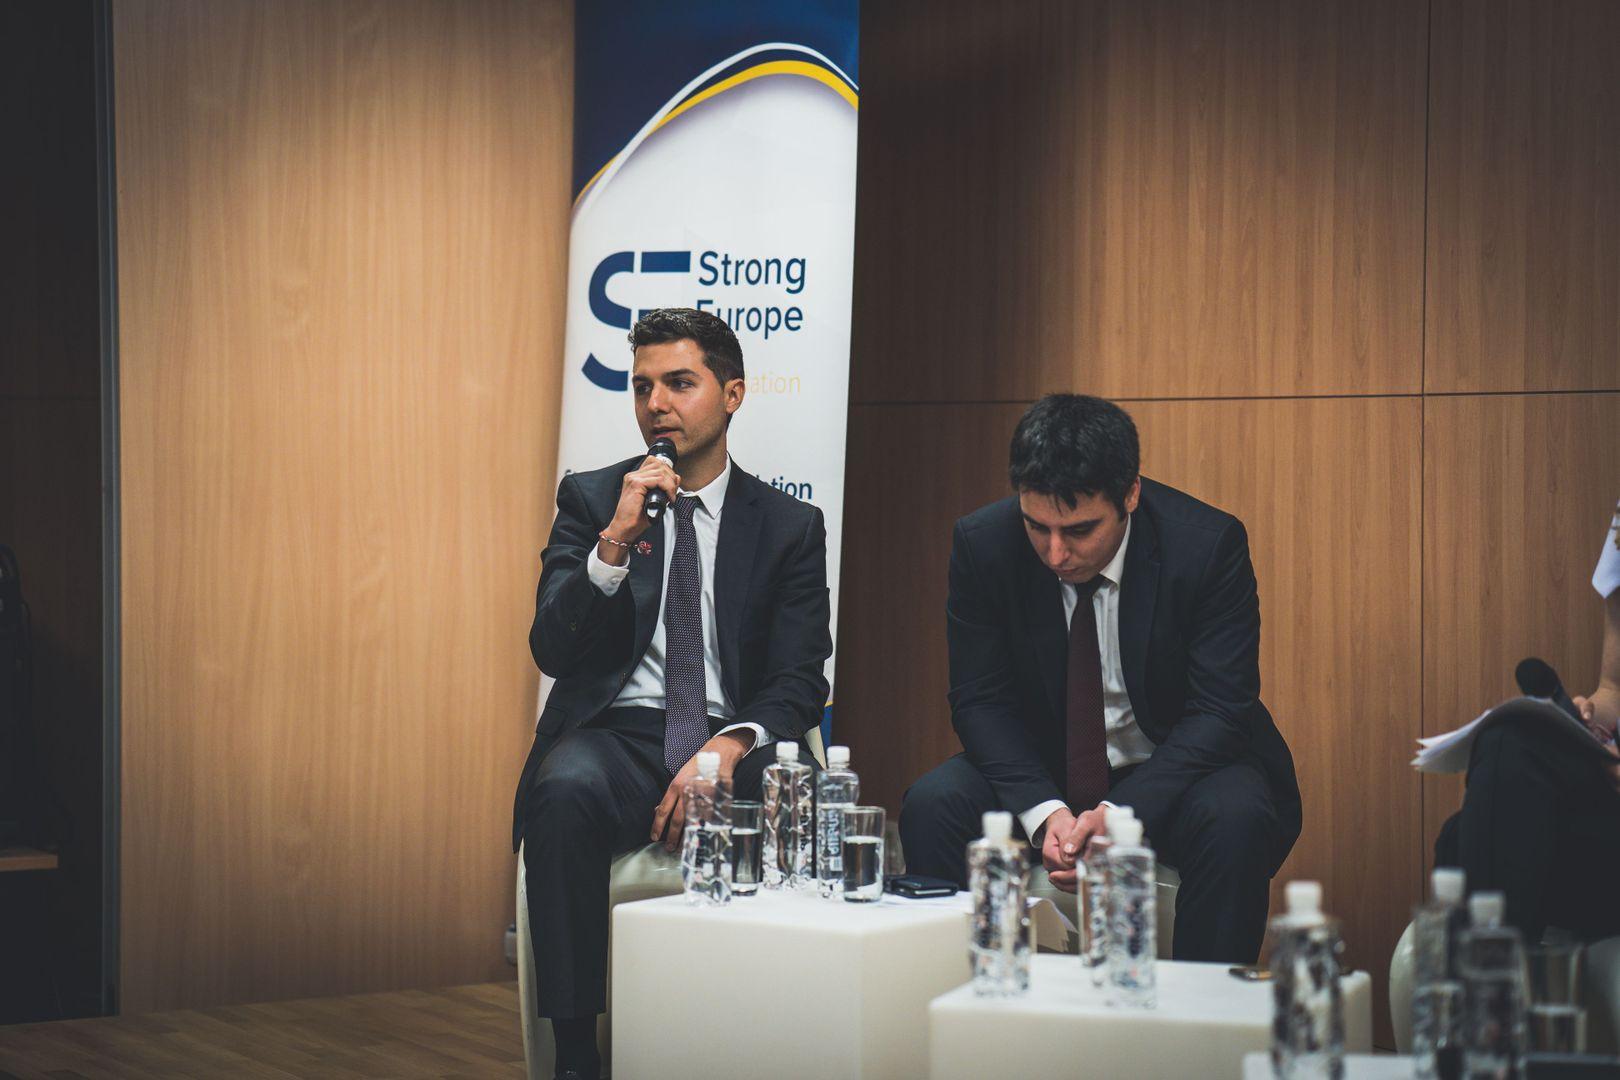 conservative-millenium-strongeurope-event-april-37